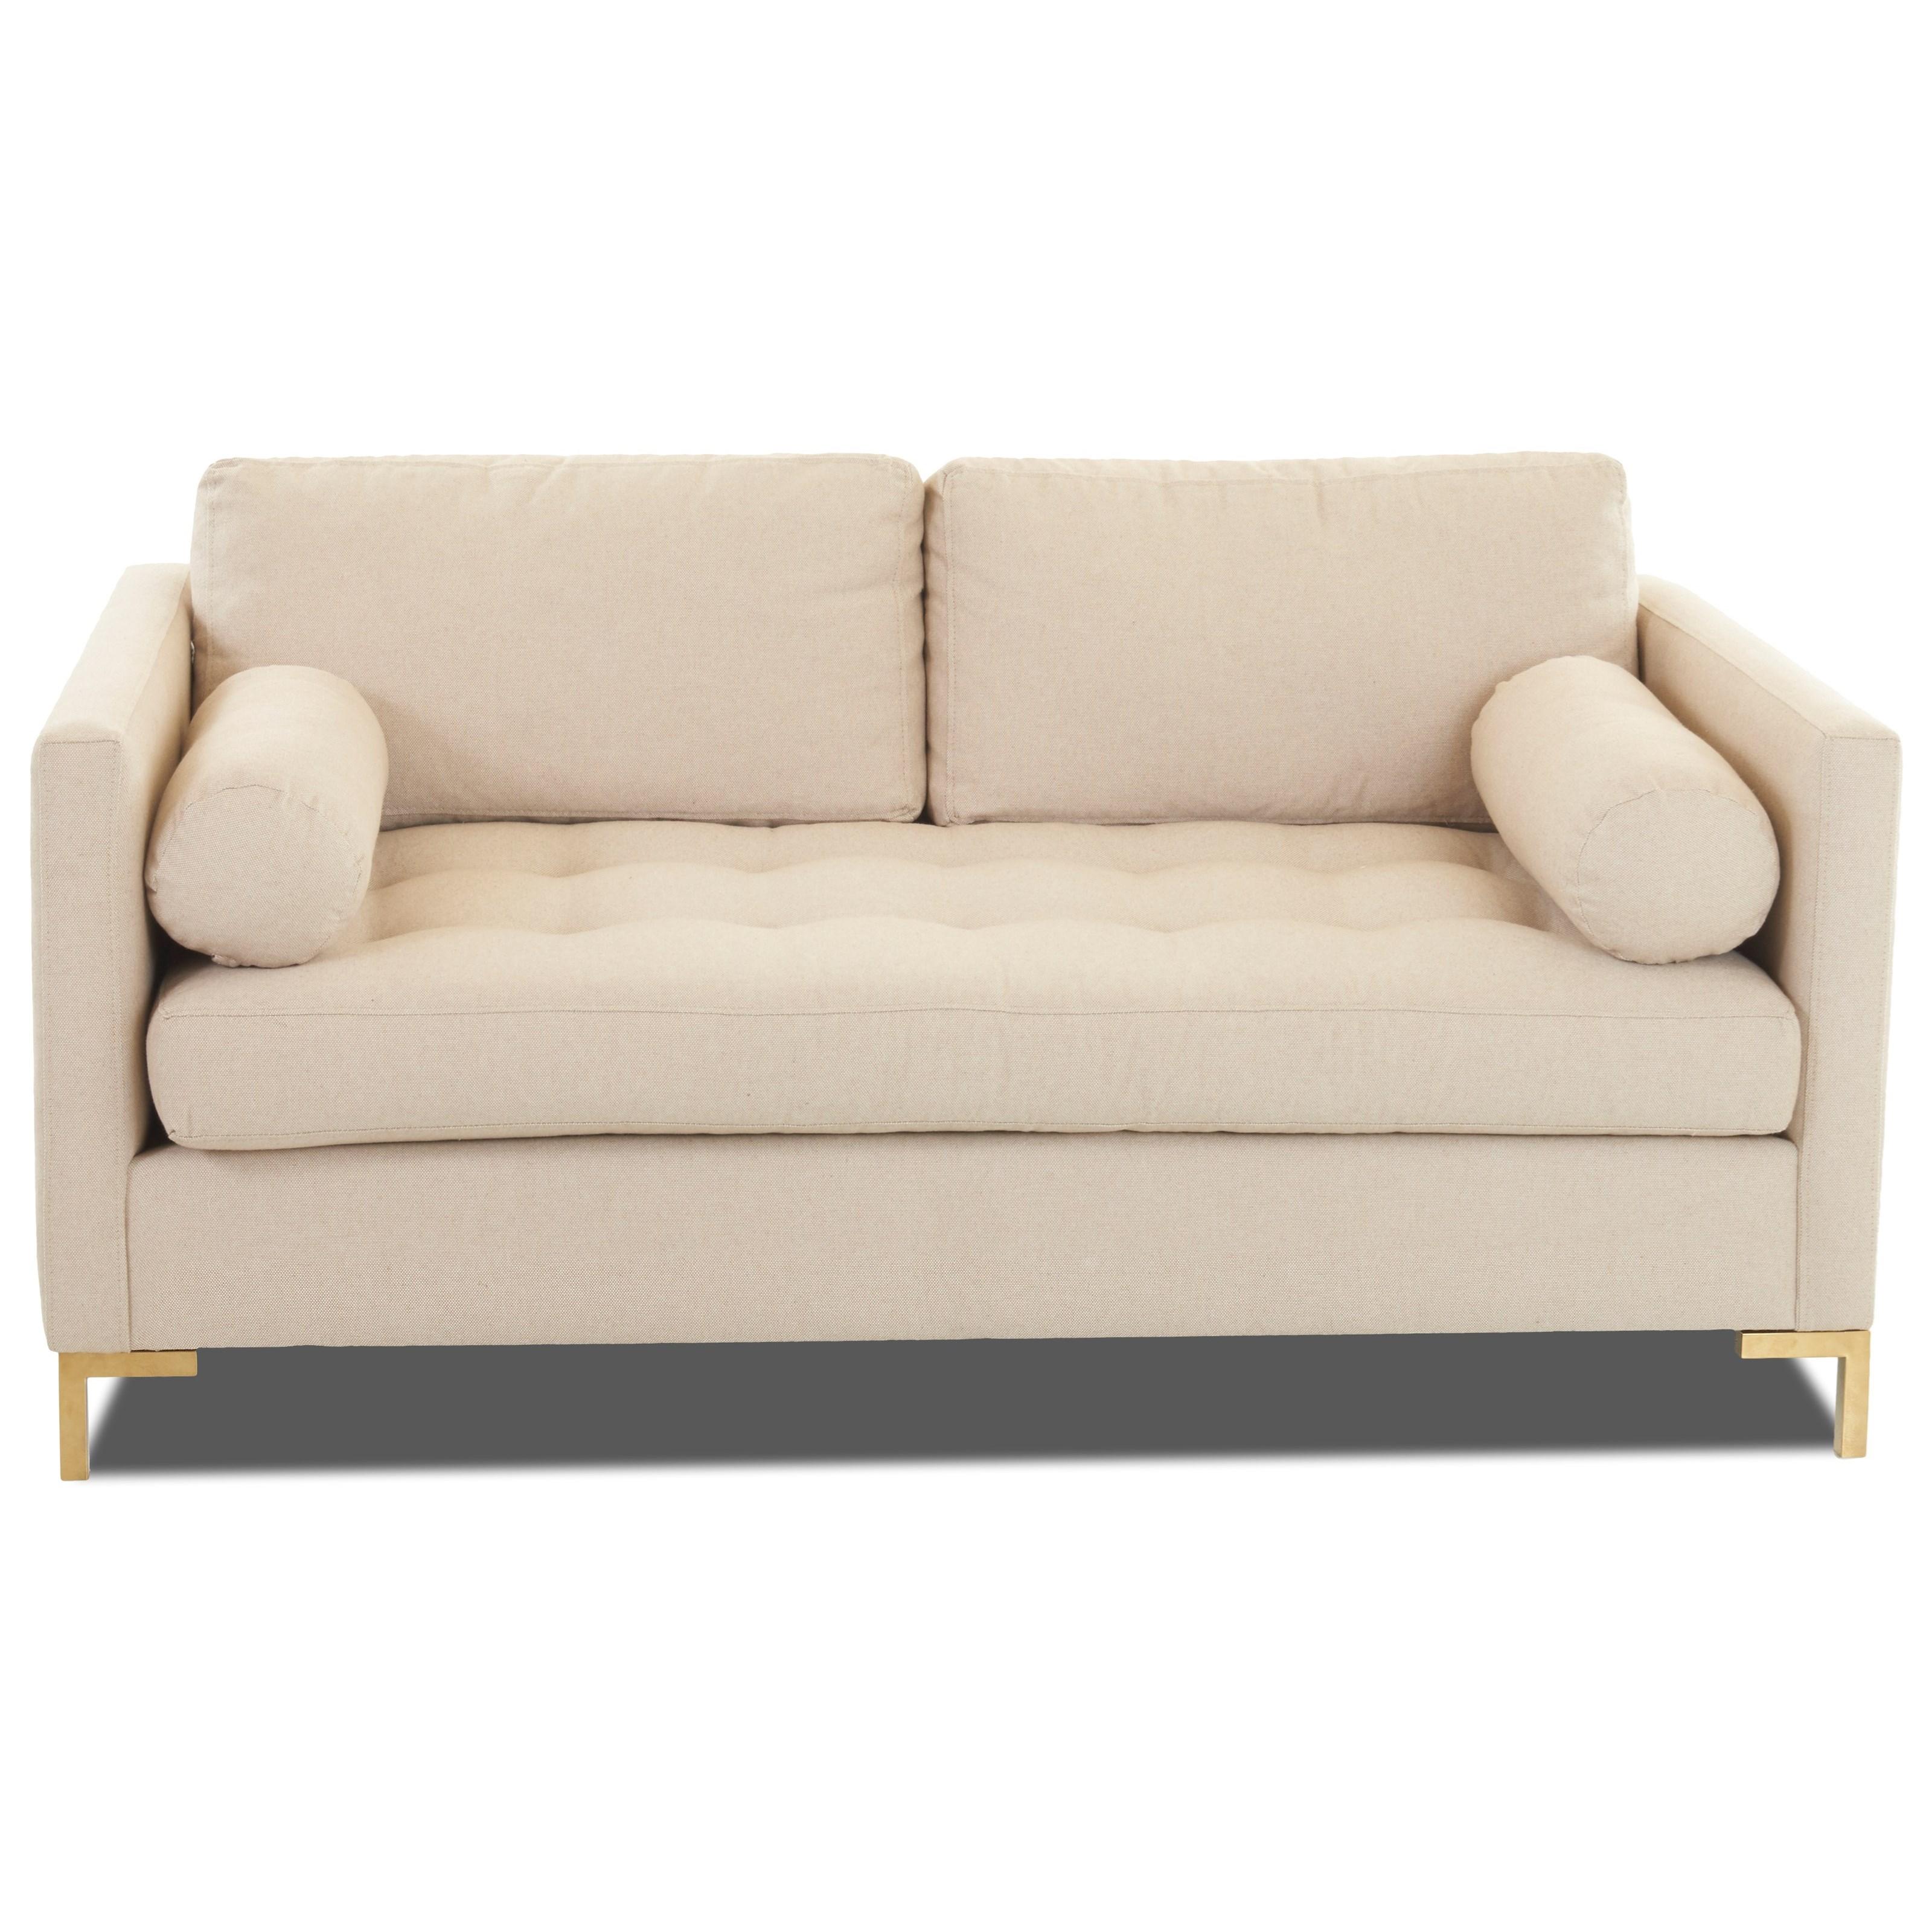 Uptown Klaussner Love Seat by Klaussner at Lapeer Furniture & Mattress Center